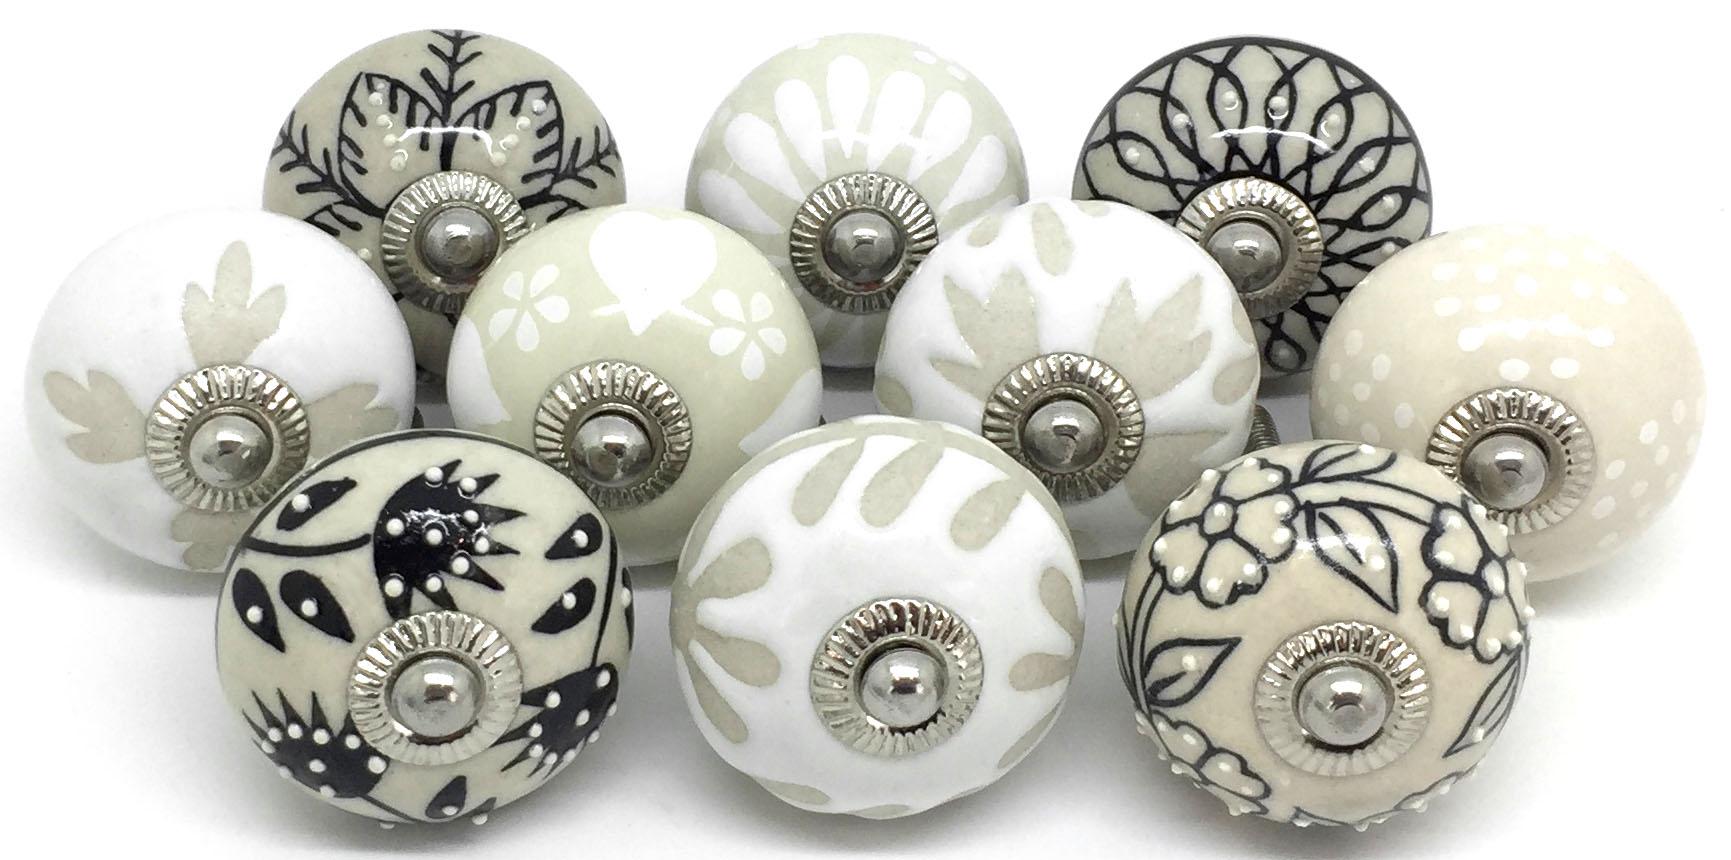 Set of 10 Cream Black White & Oatmeal Ceramic Knobs E10-8